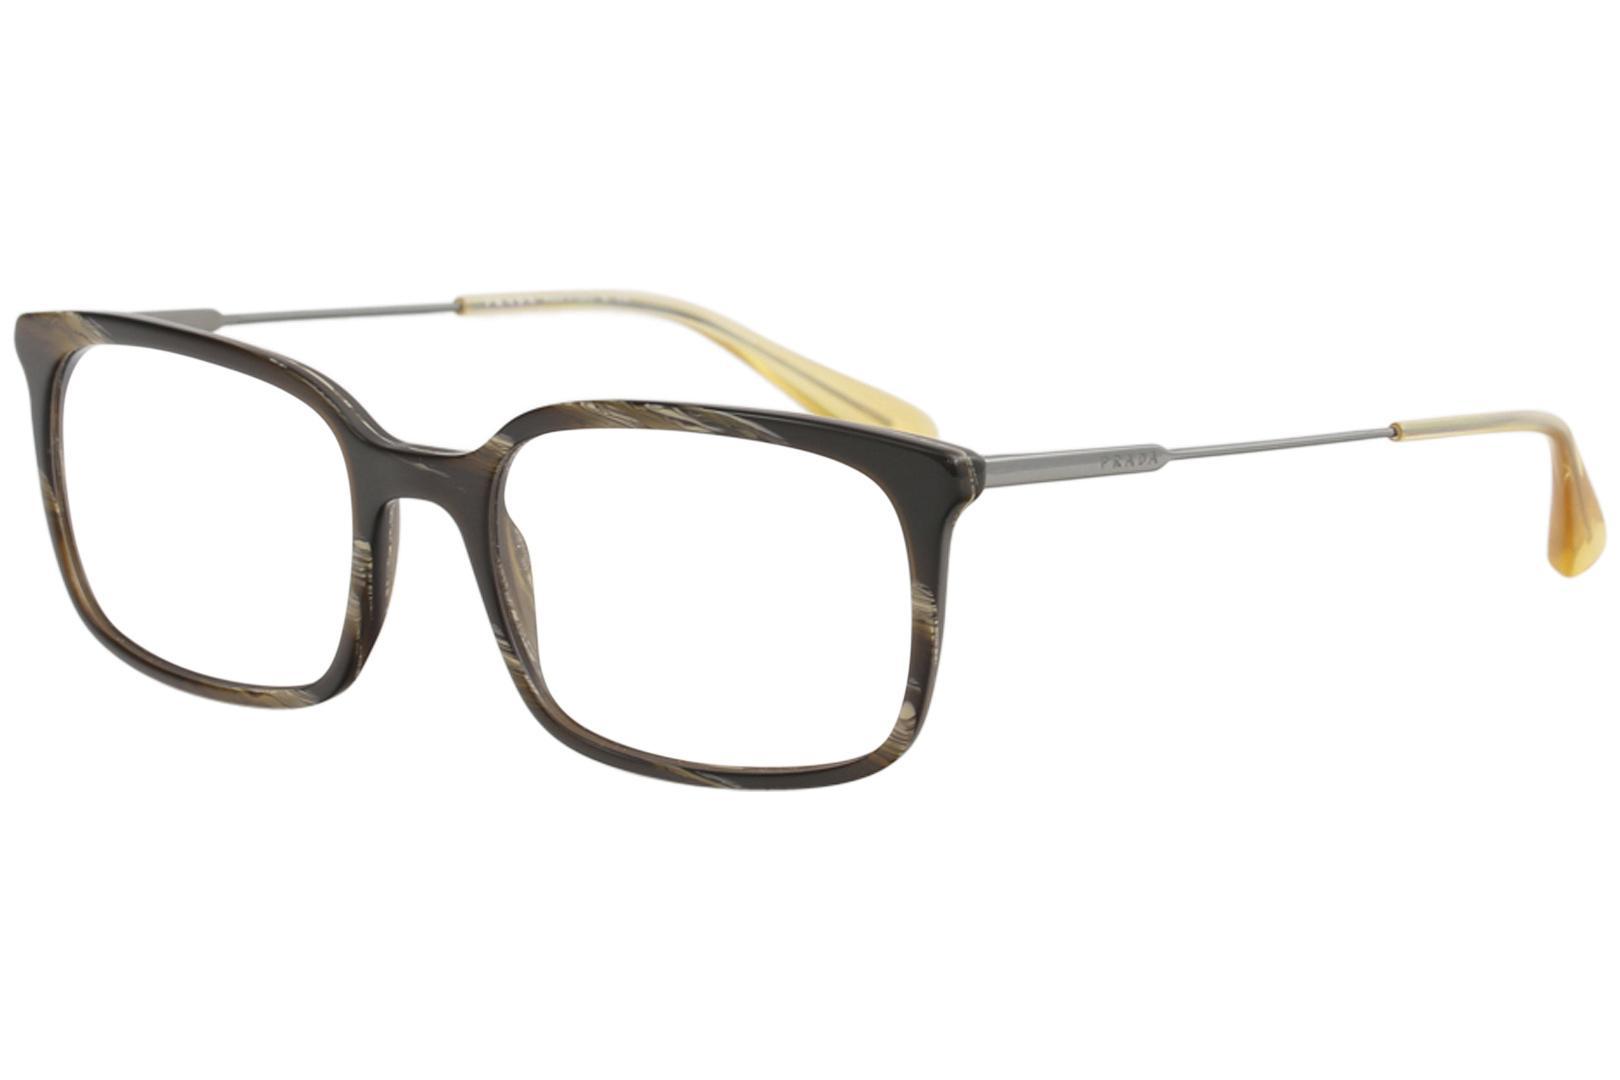 541ad1c723d Prada Men s Eyeglasses VPR16U VPR 16U Full Rim Optical Frame